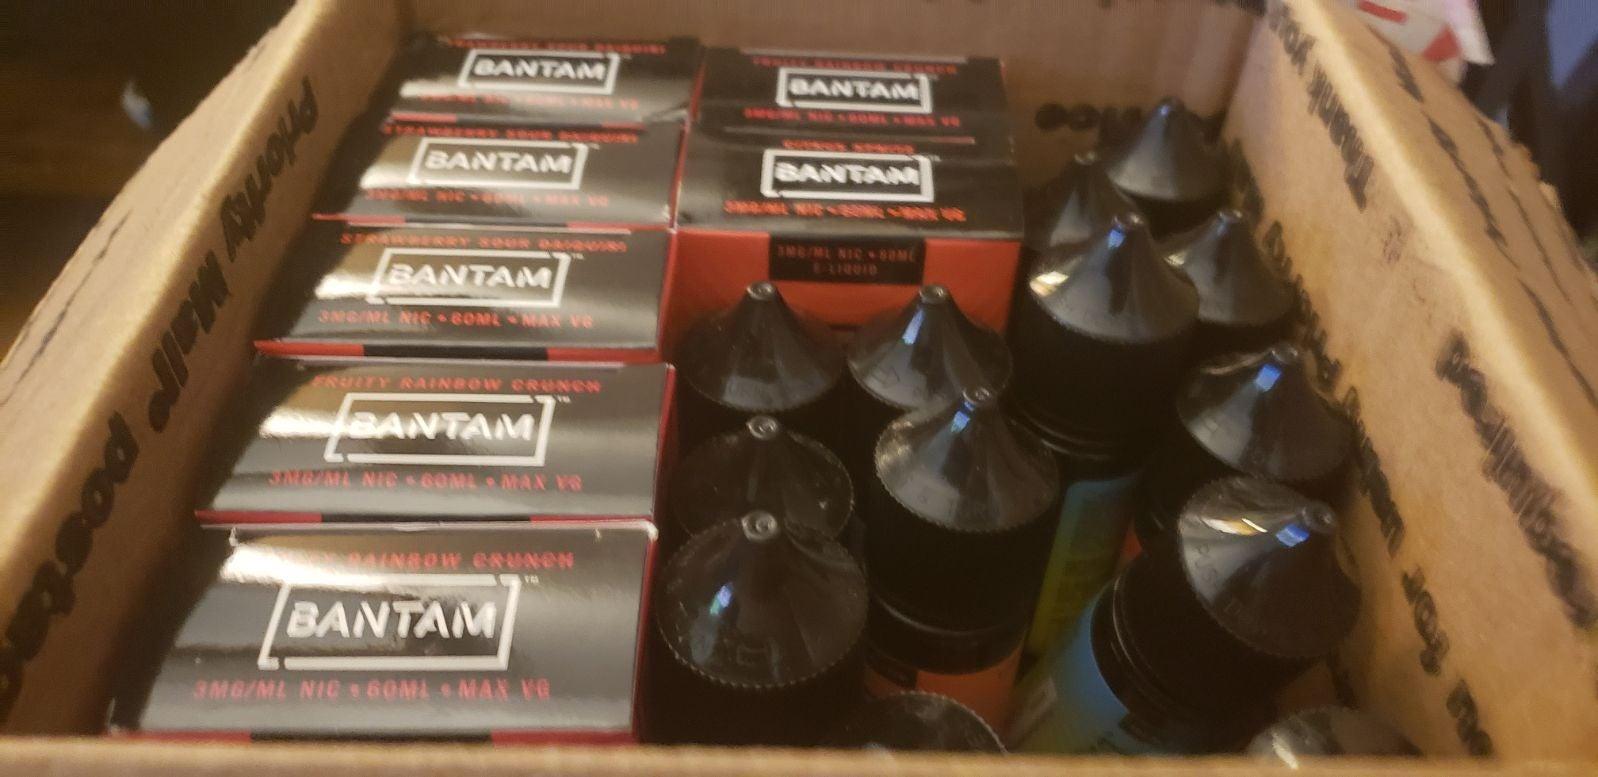 BANTAM 60 ML VAPERS